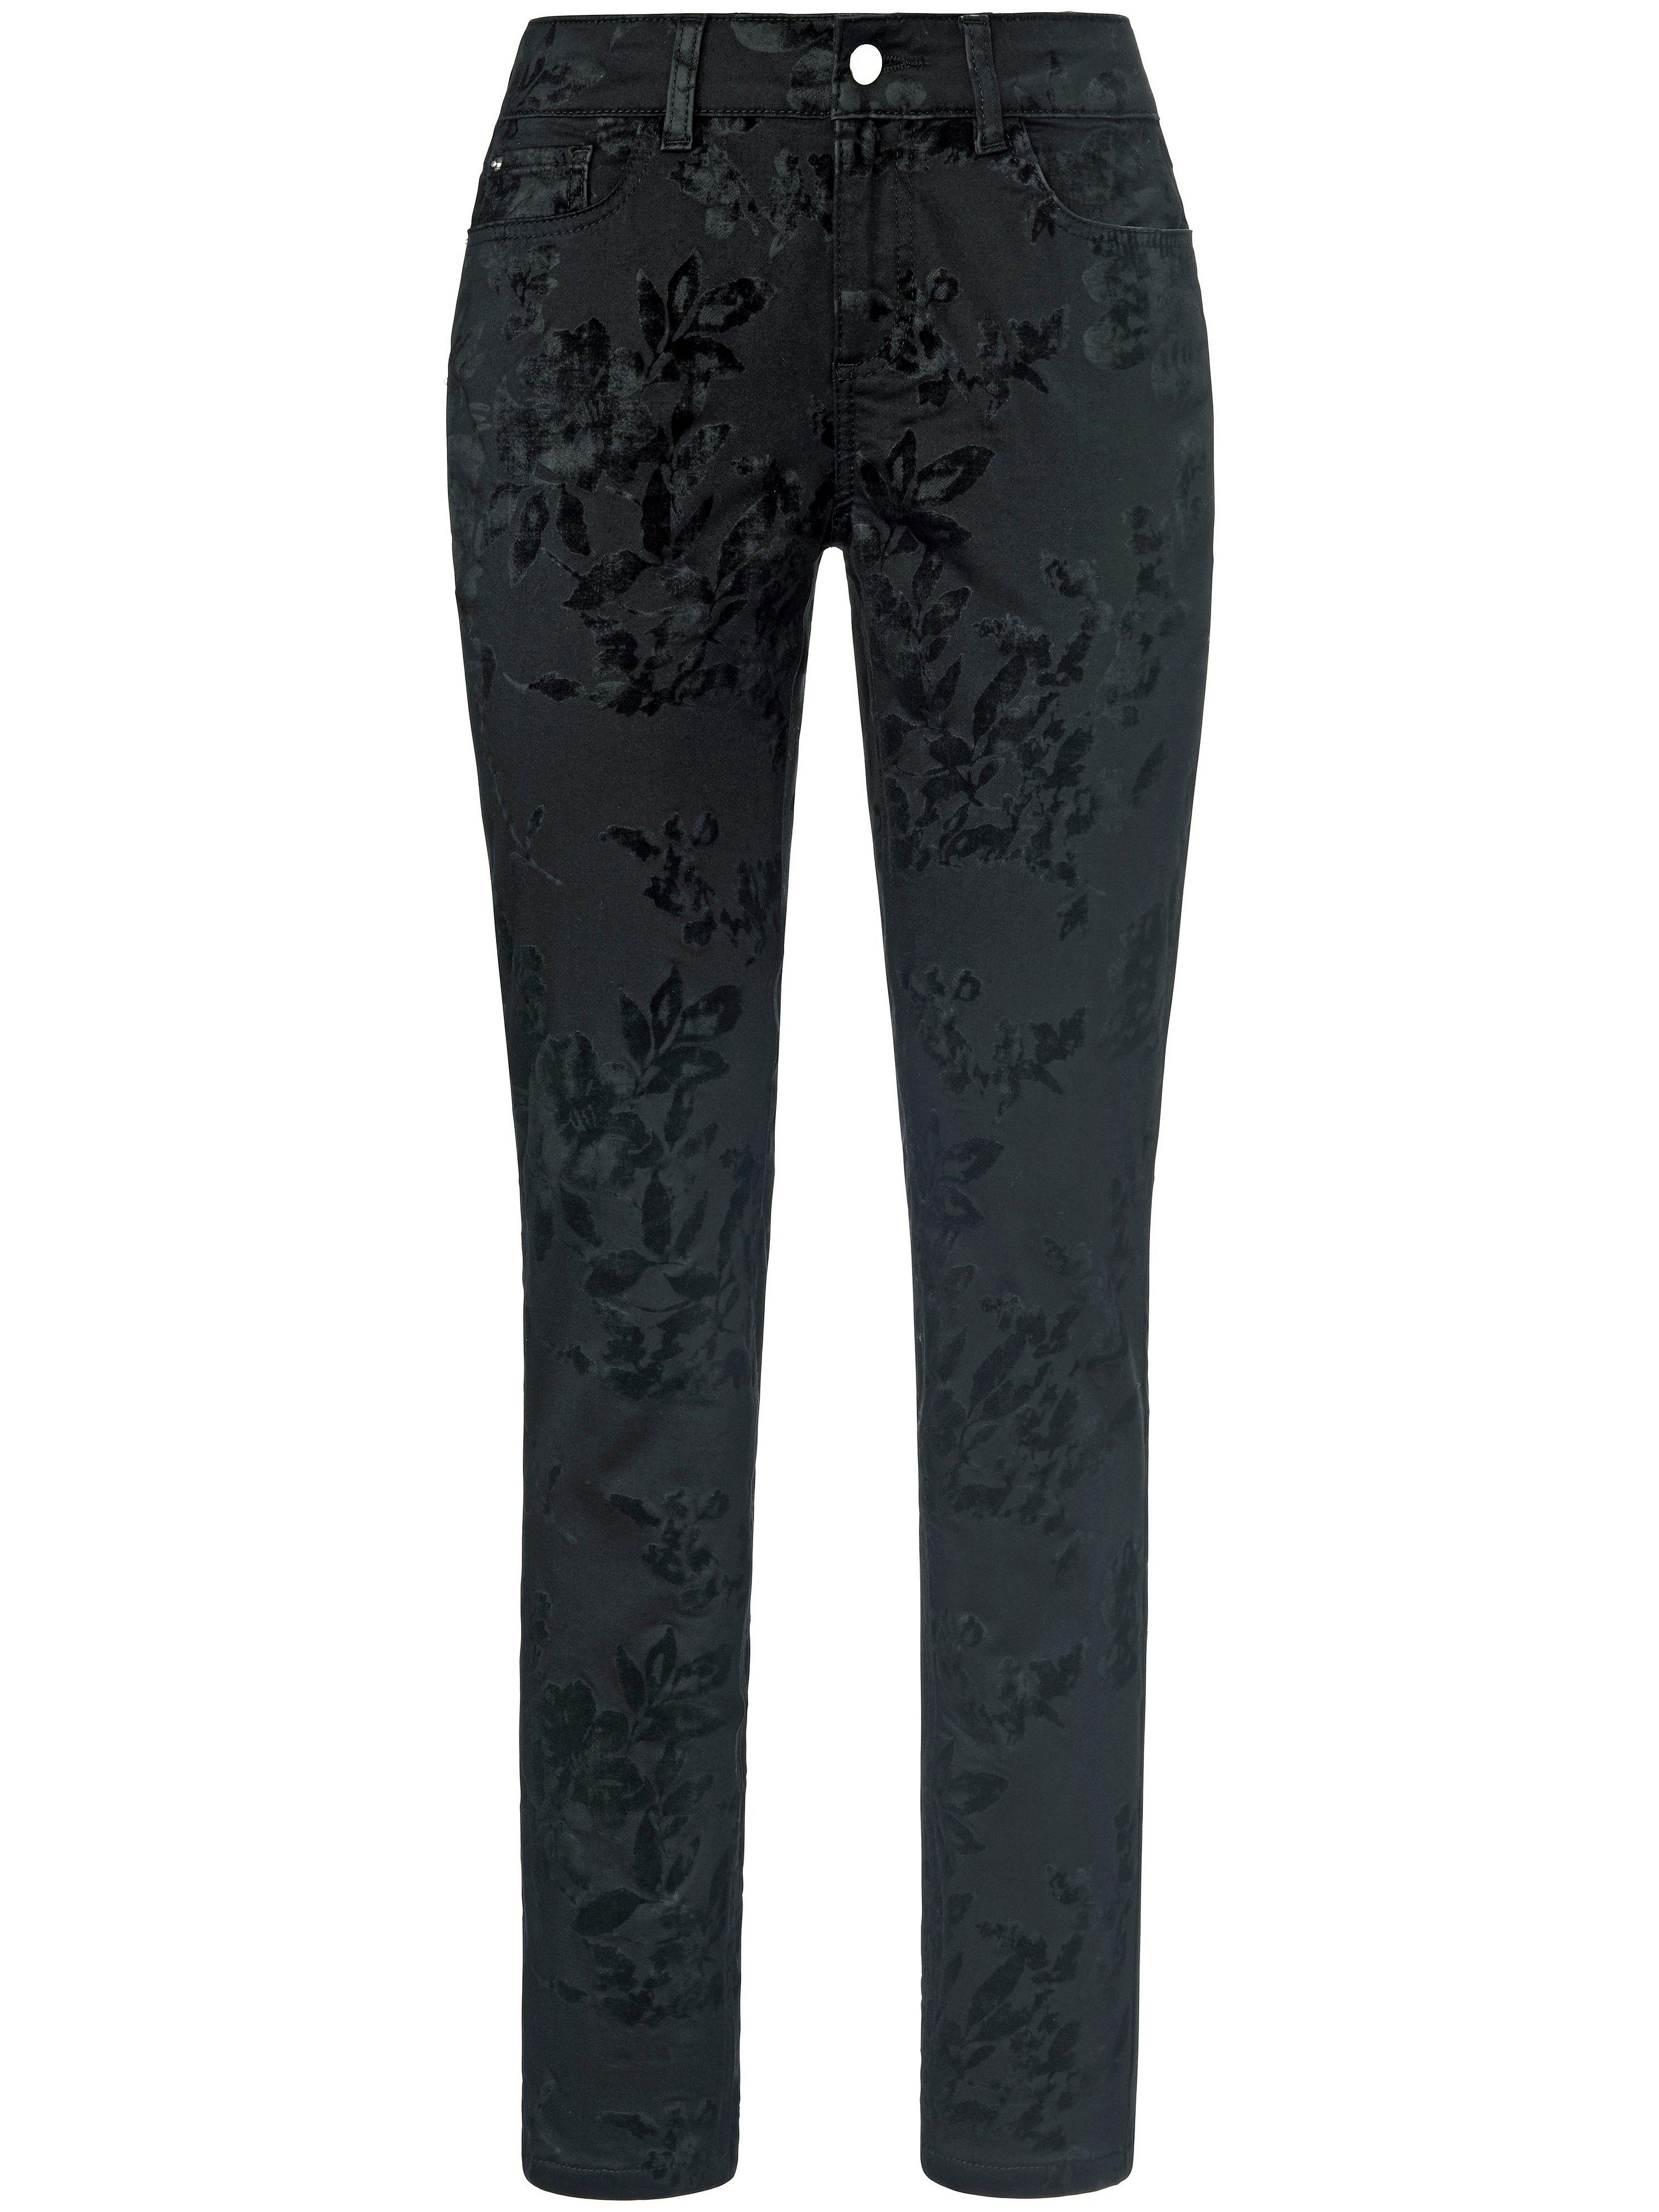 Jeans flockprint Van TALBOT RUNHOF X PETER HAHN zwart